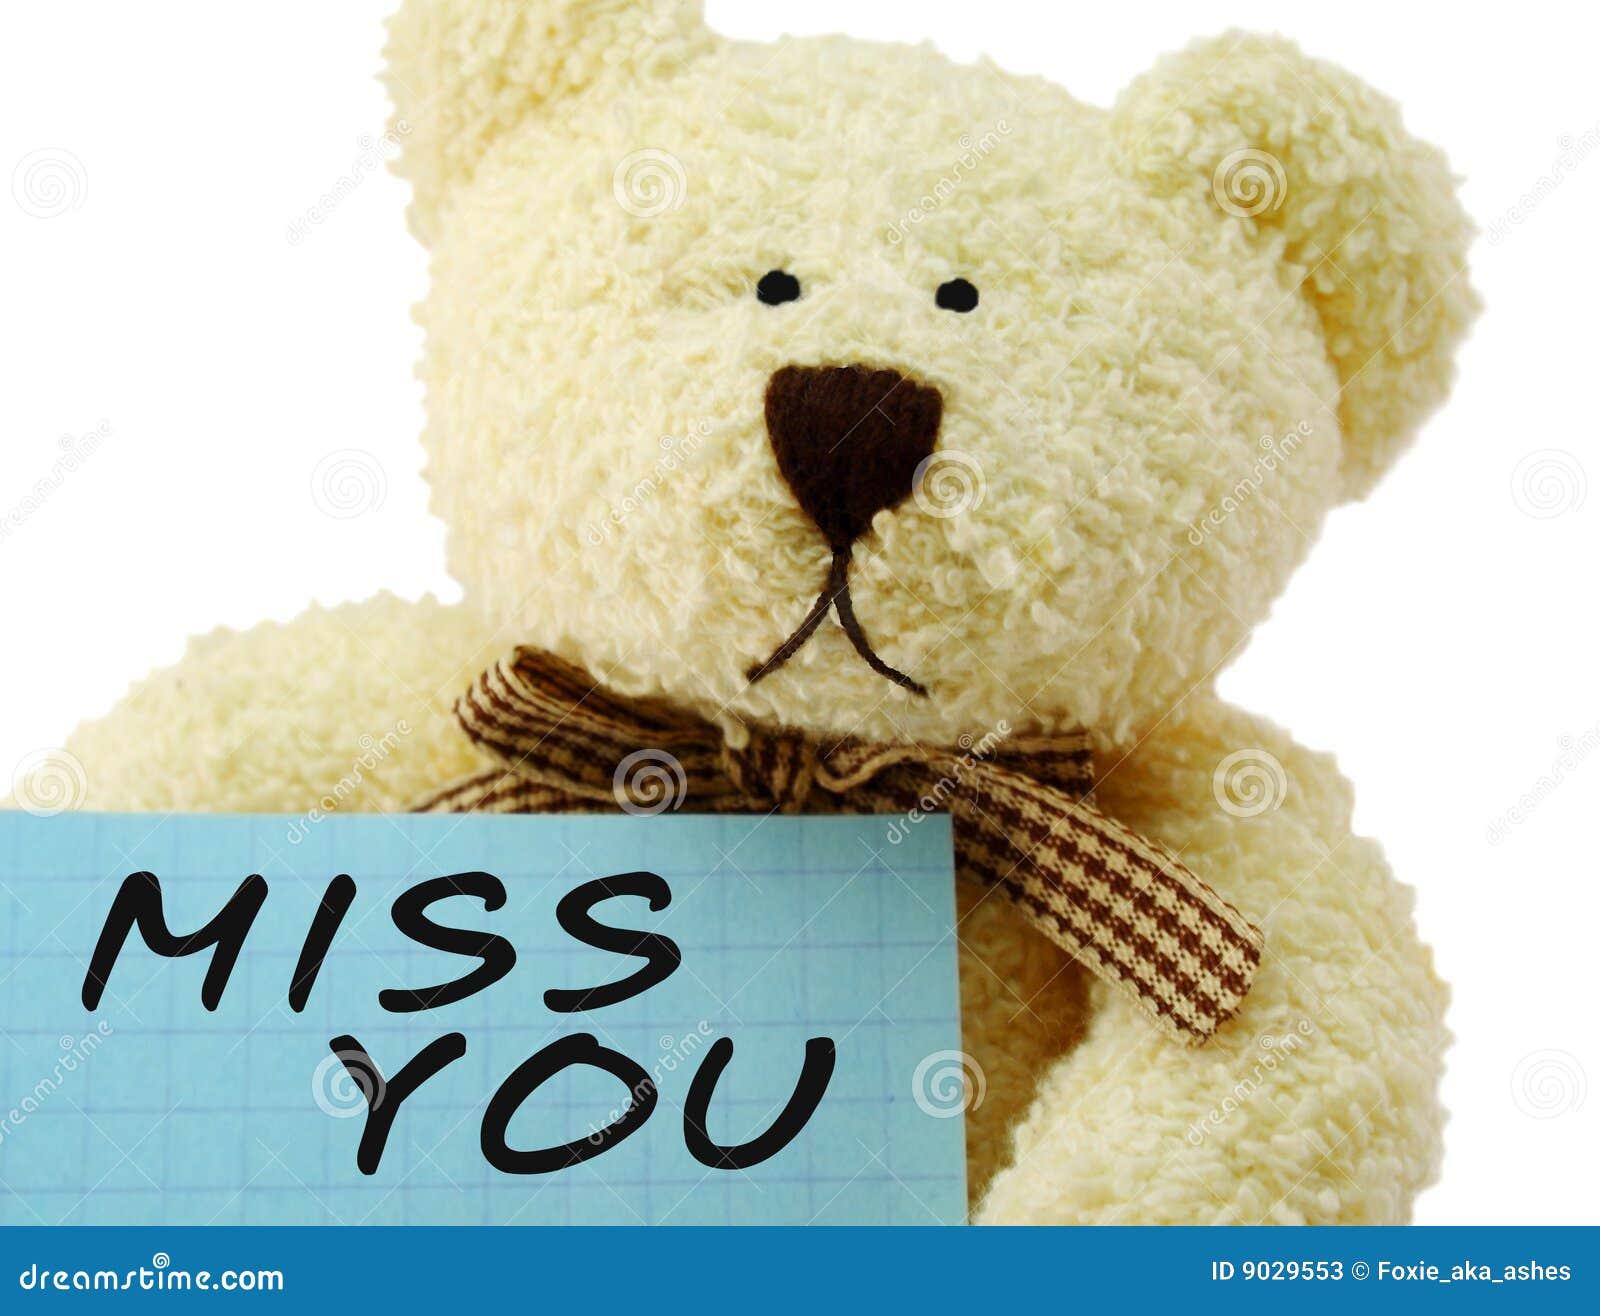 I Miss U Teddy Bear - Viewing Gallery